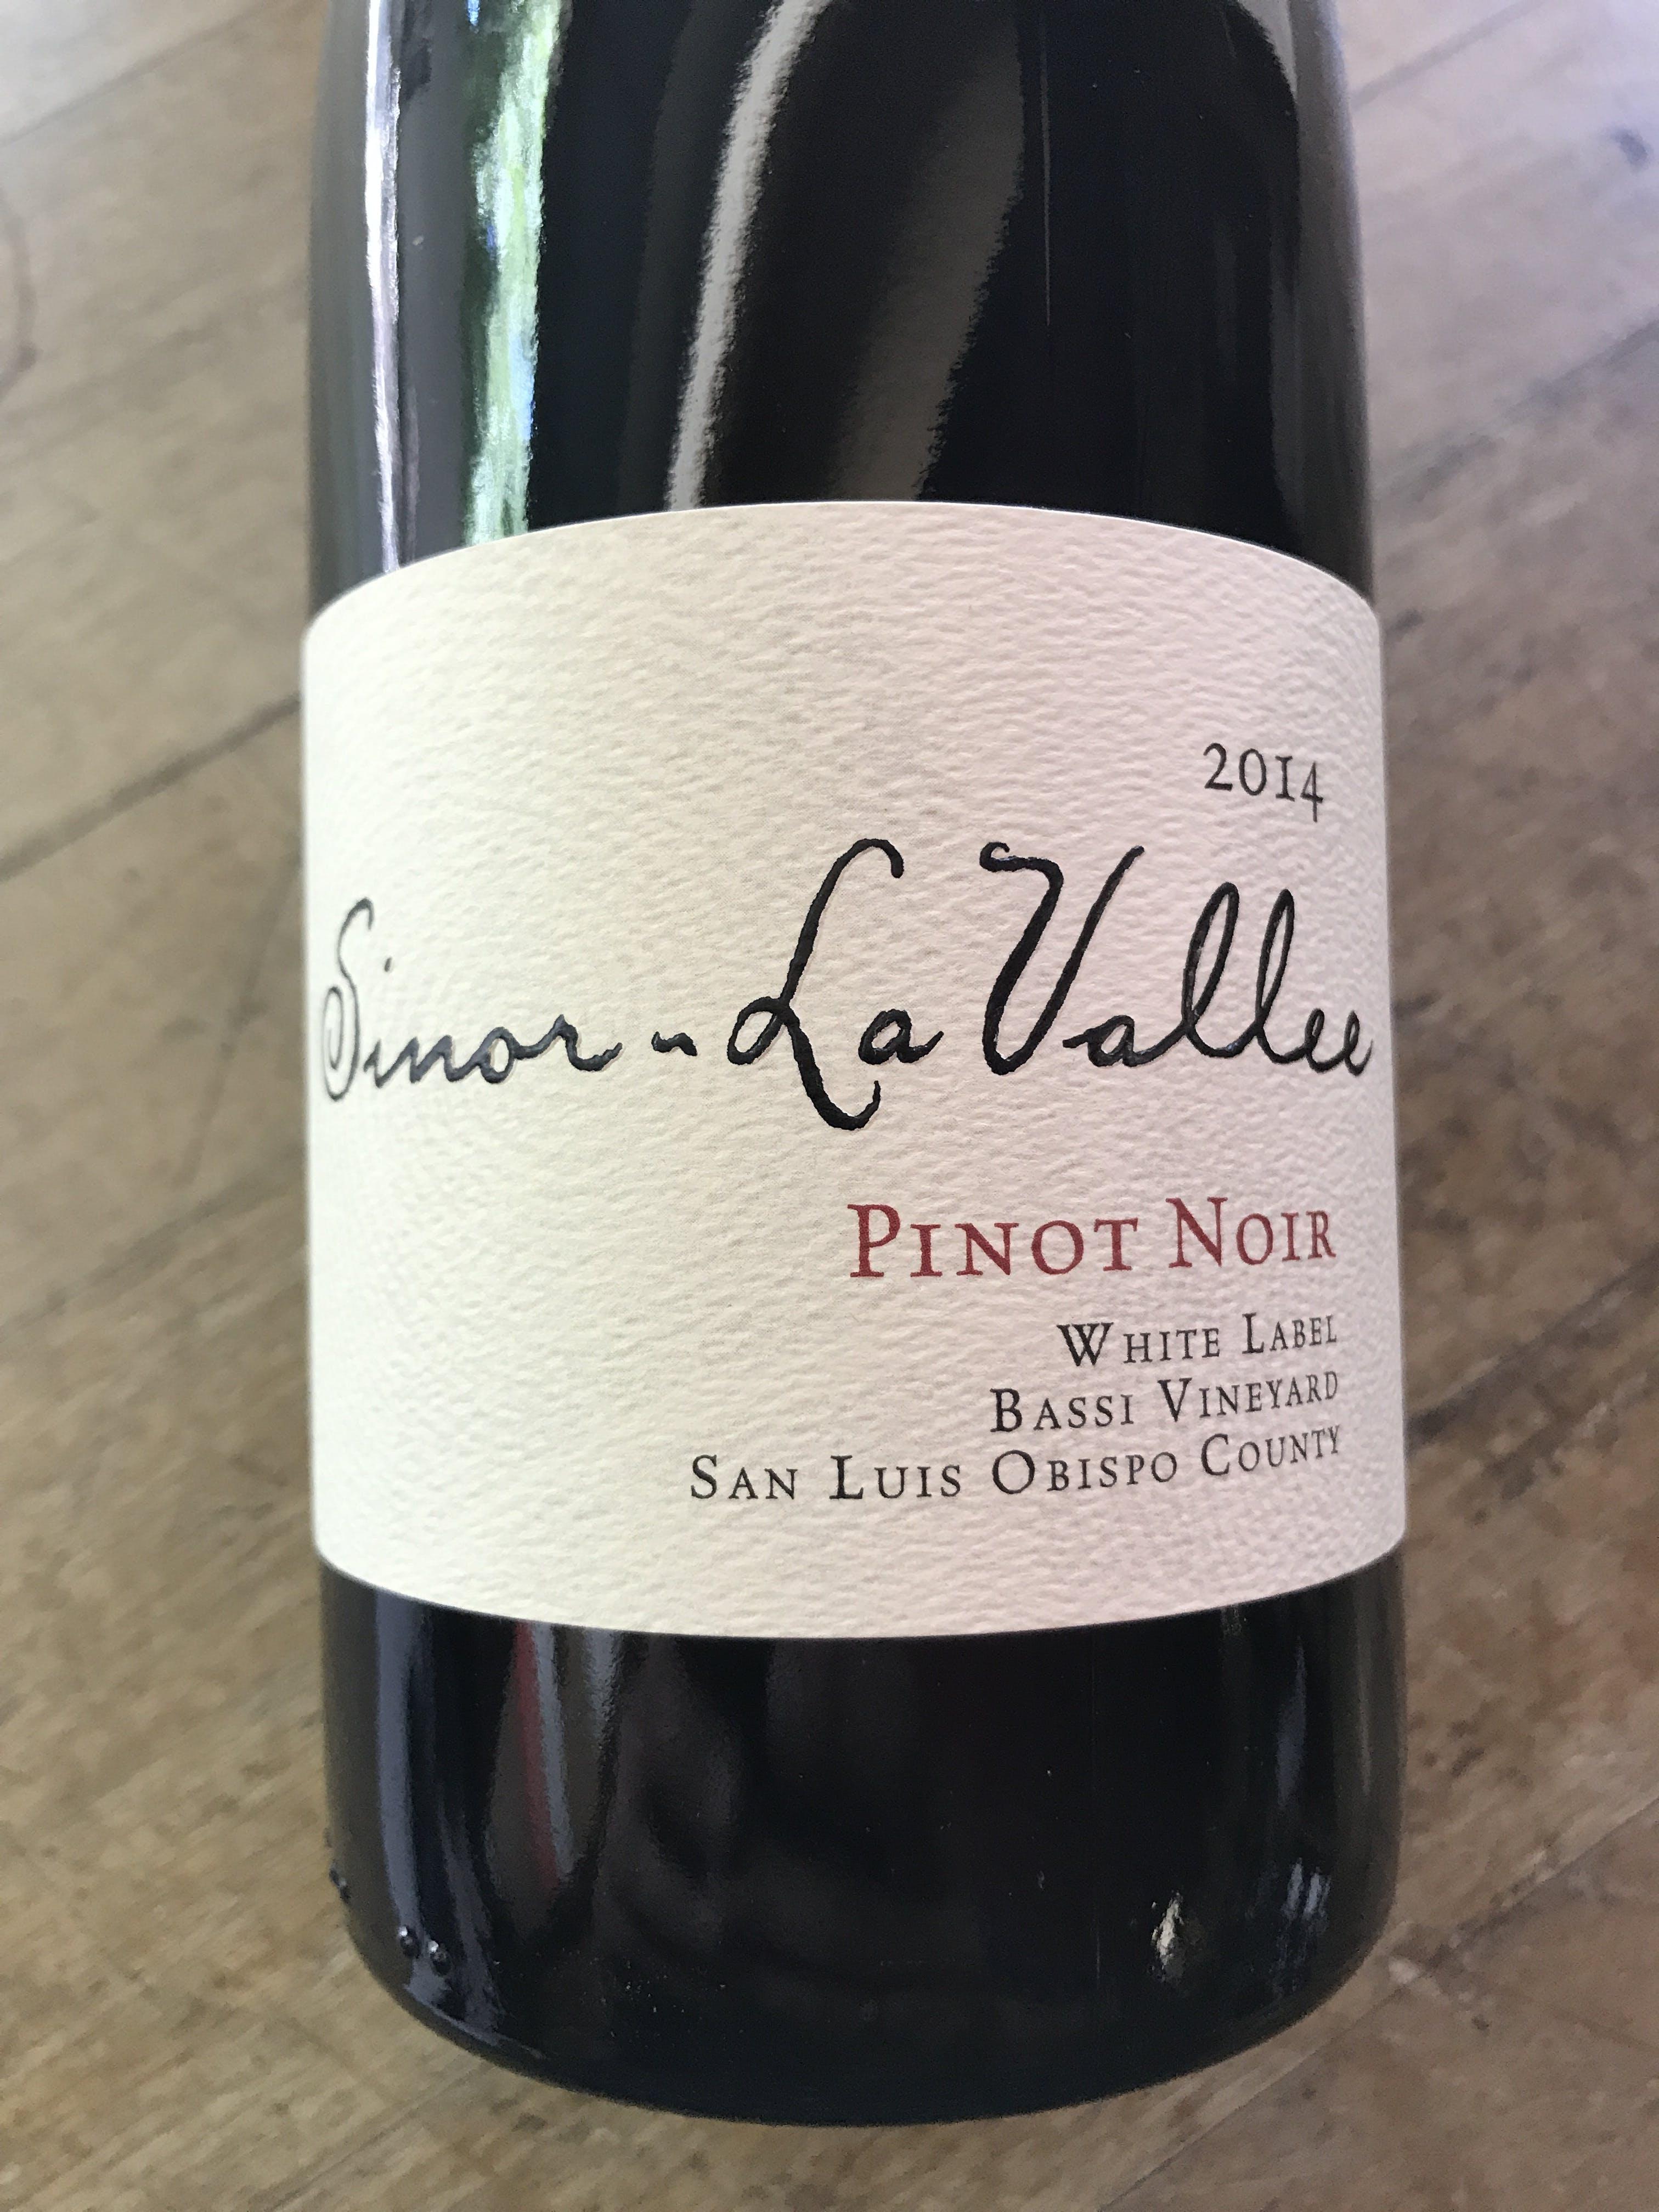 Sinor Lavallee White Label Bassi Vineyard Pinot Noir 2014